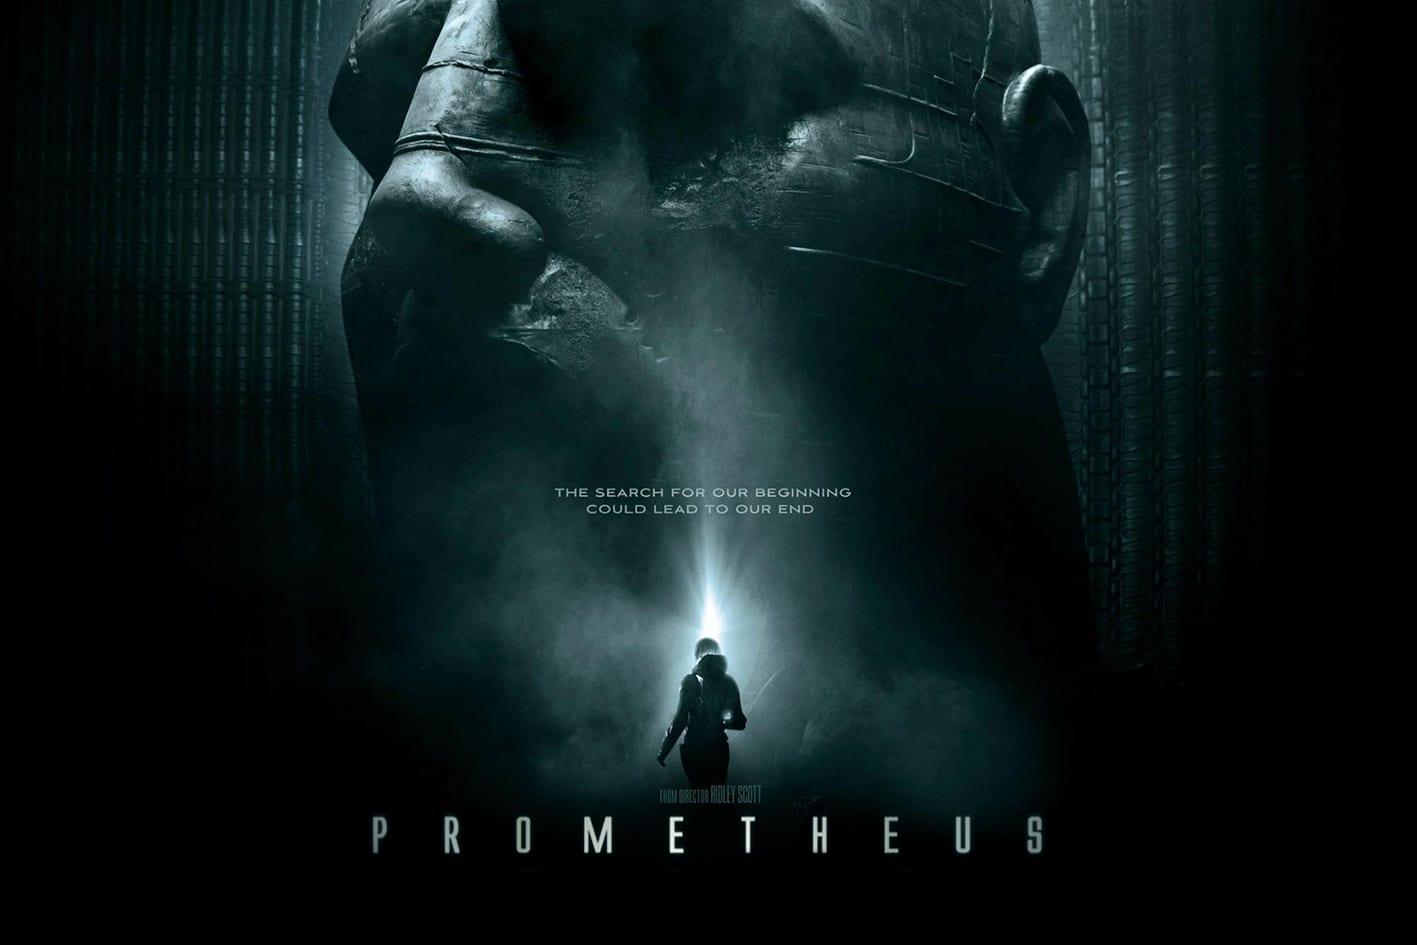 Ridley Scott's Prometheus